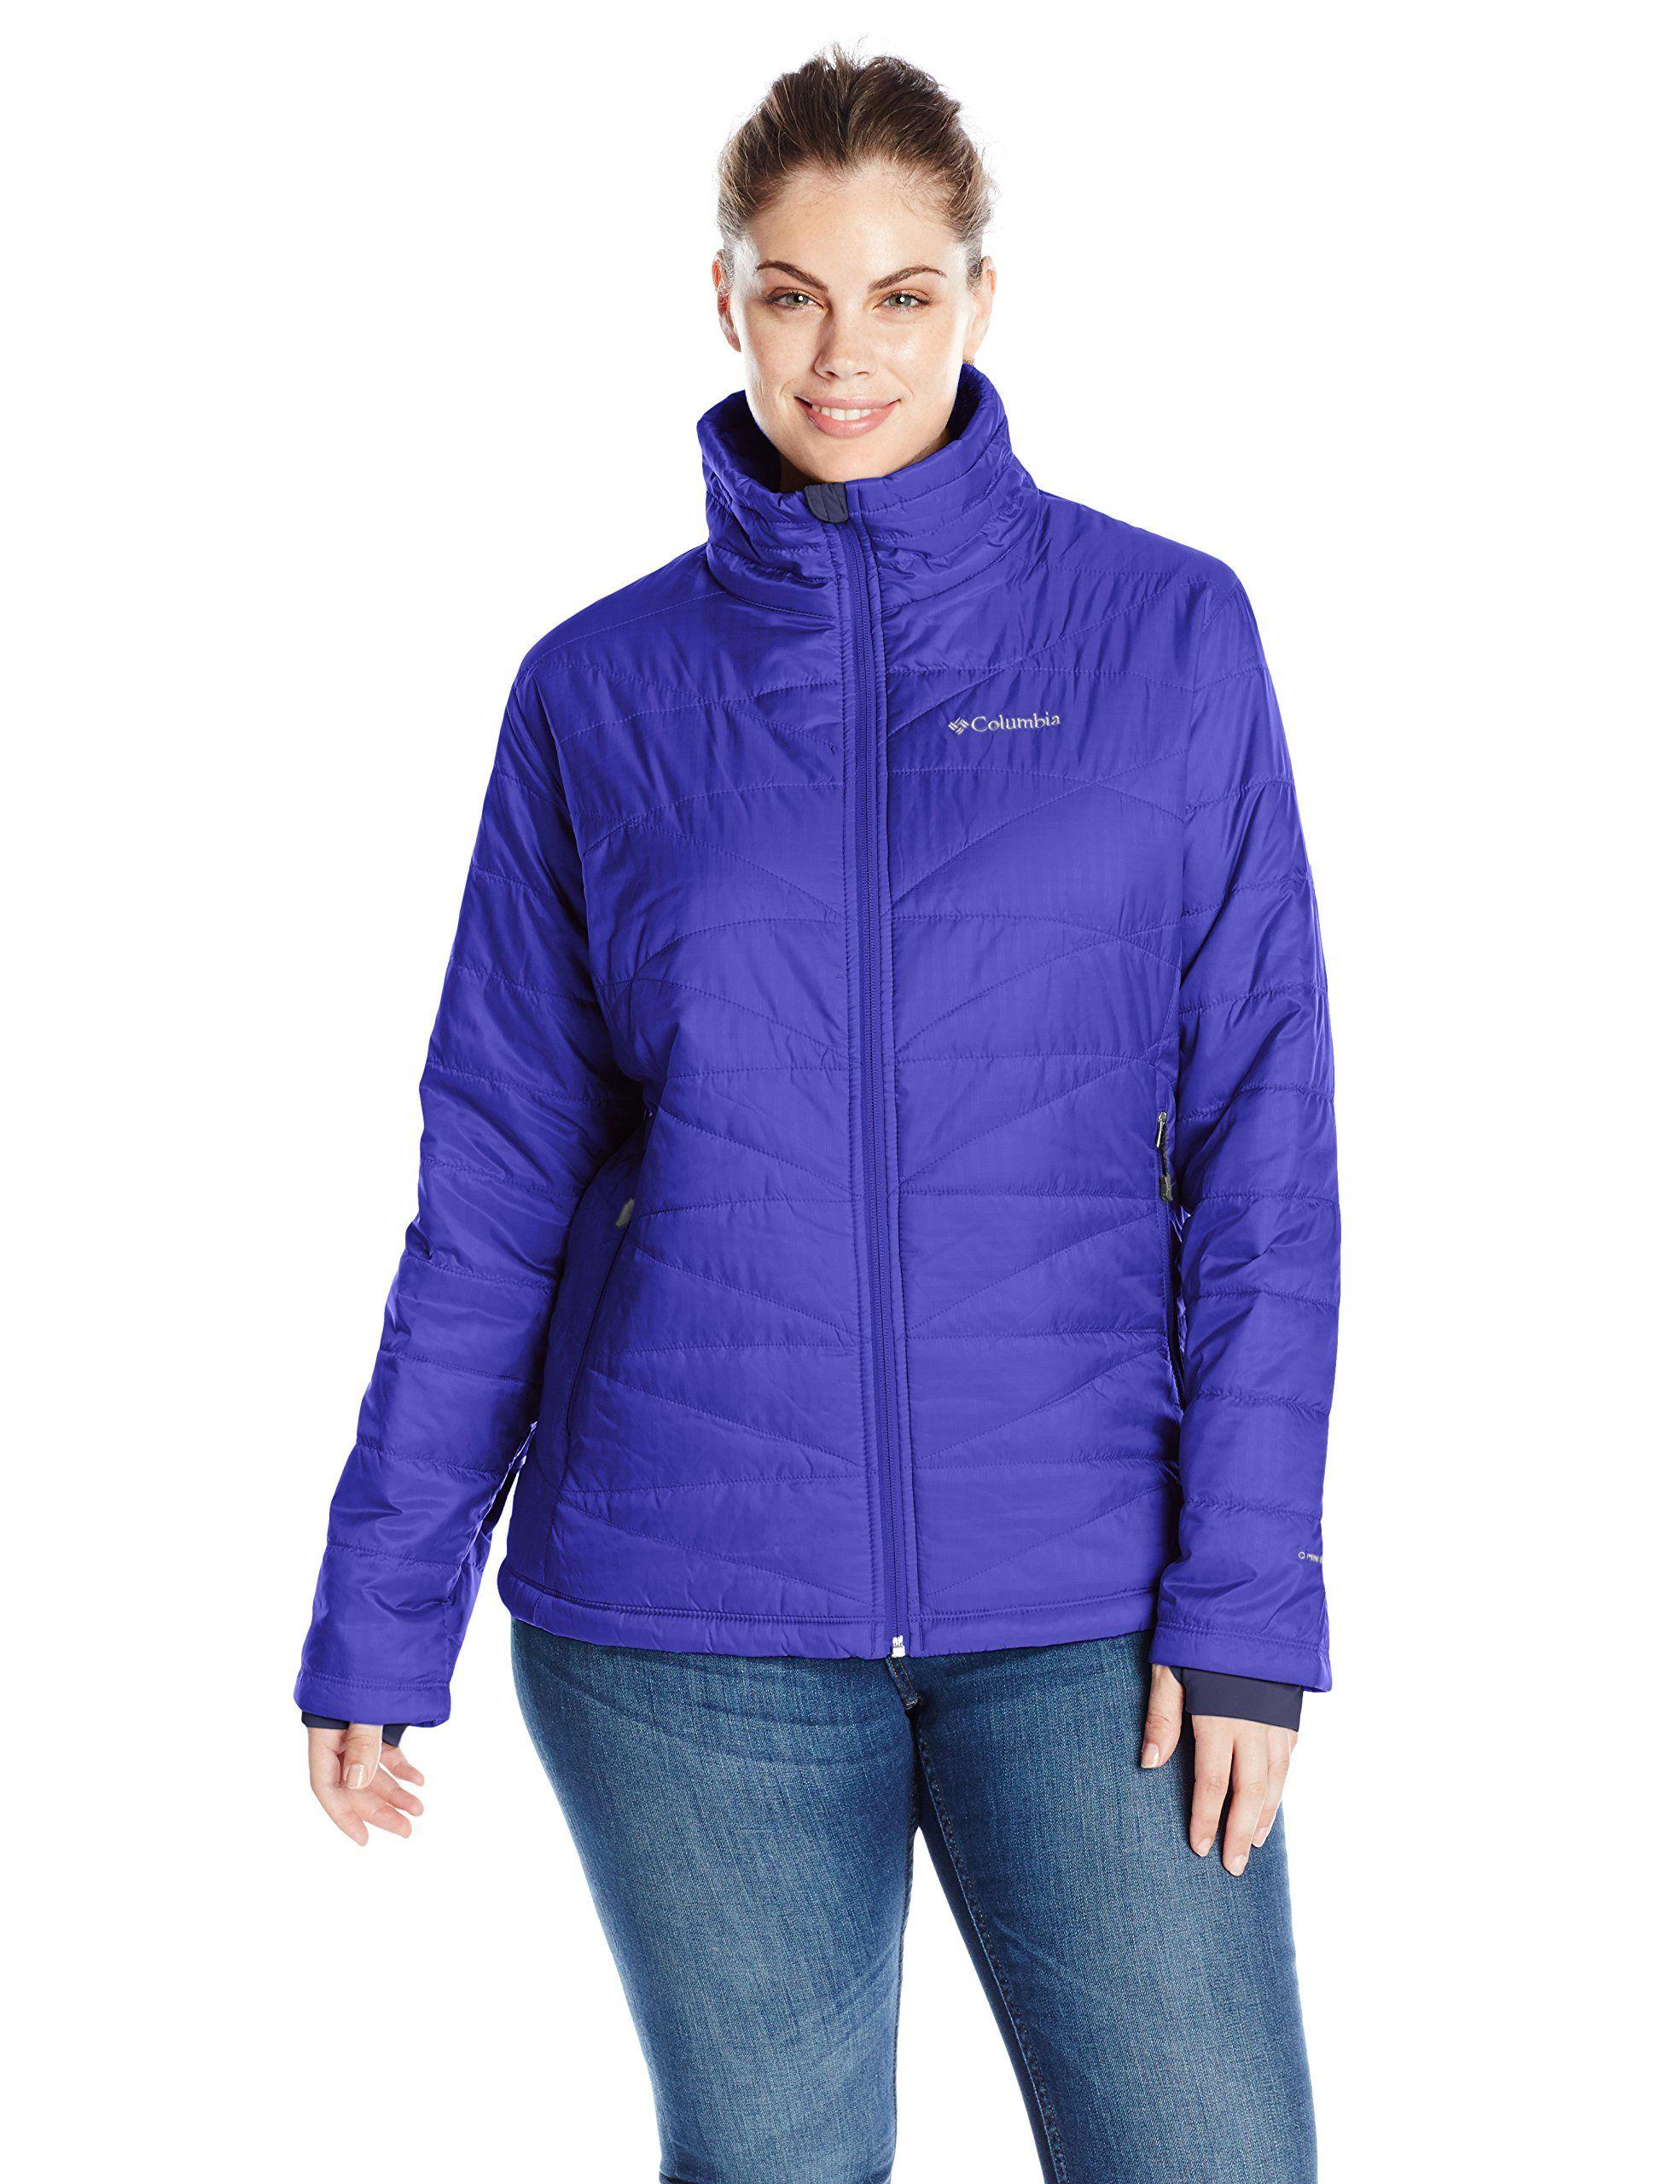 008829dc87f11 Columbia Women s Plus Size Mighty Lite iii Jacket